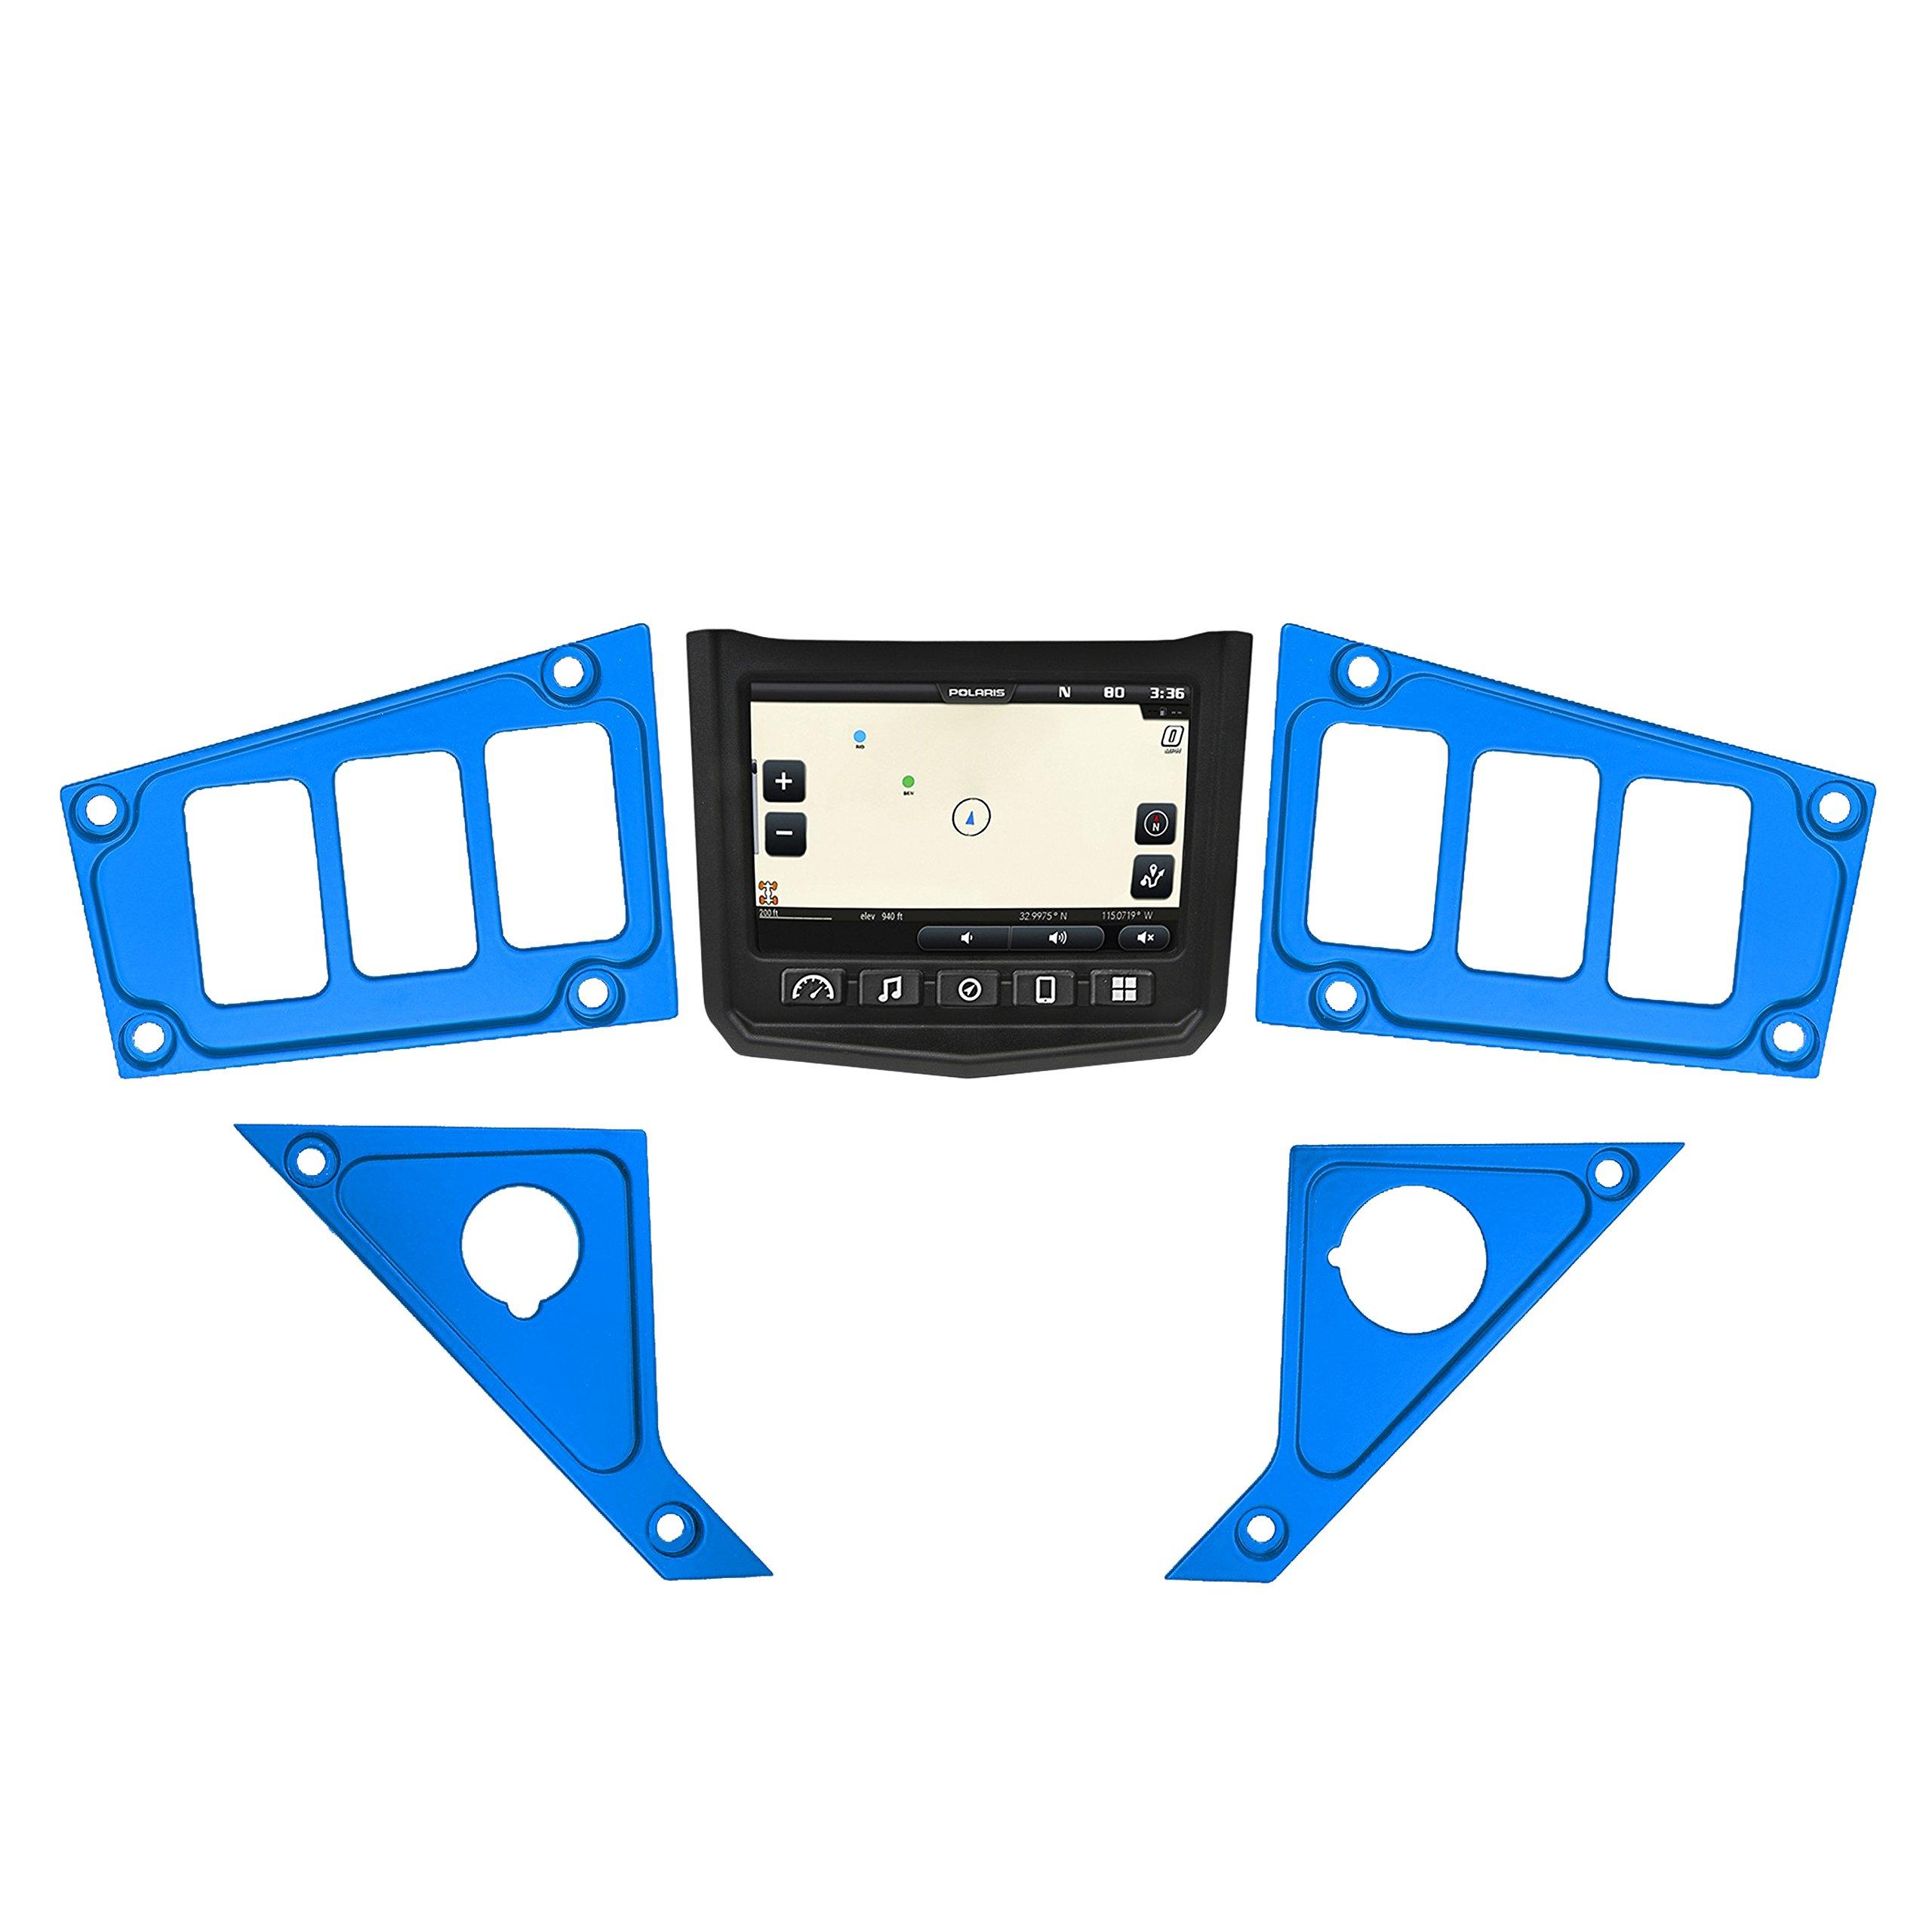 STV Motorsports 2017-2018 Polaris RZR XP 1000 RIDE COMMAND Custom Switch Dash Panel Plates - 100% MADE in USA (short kit, blue)